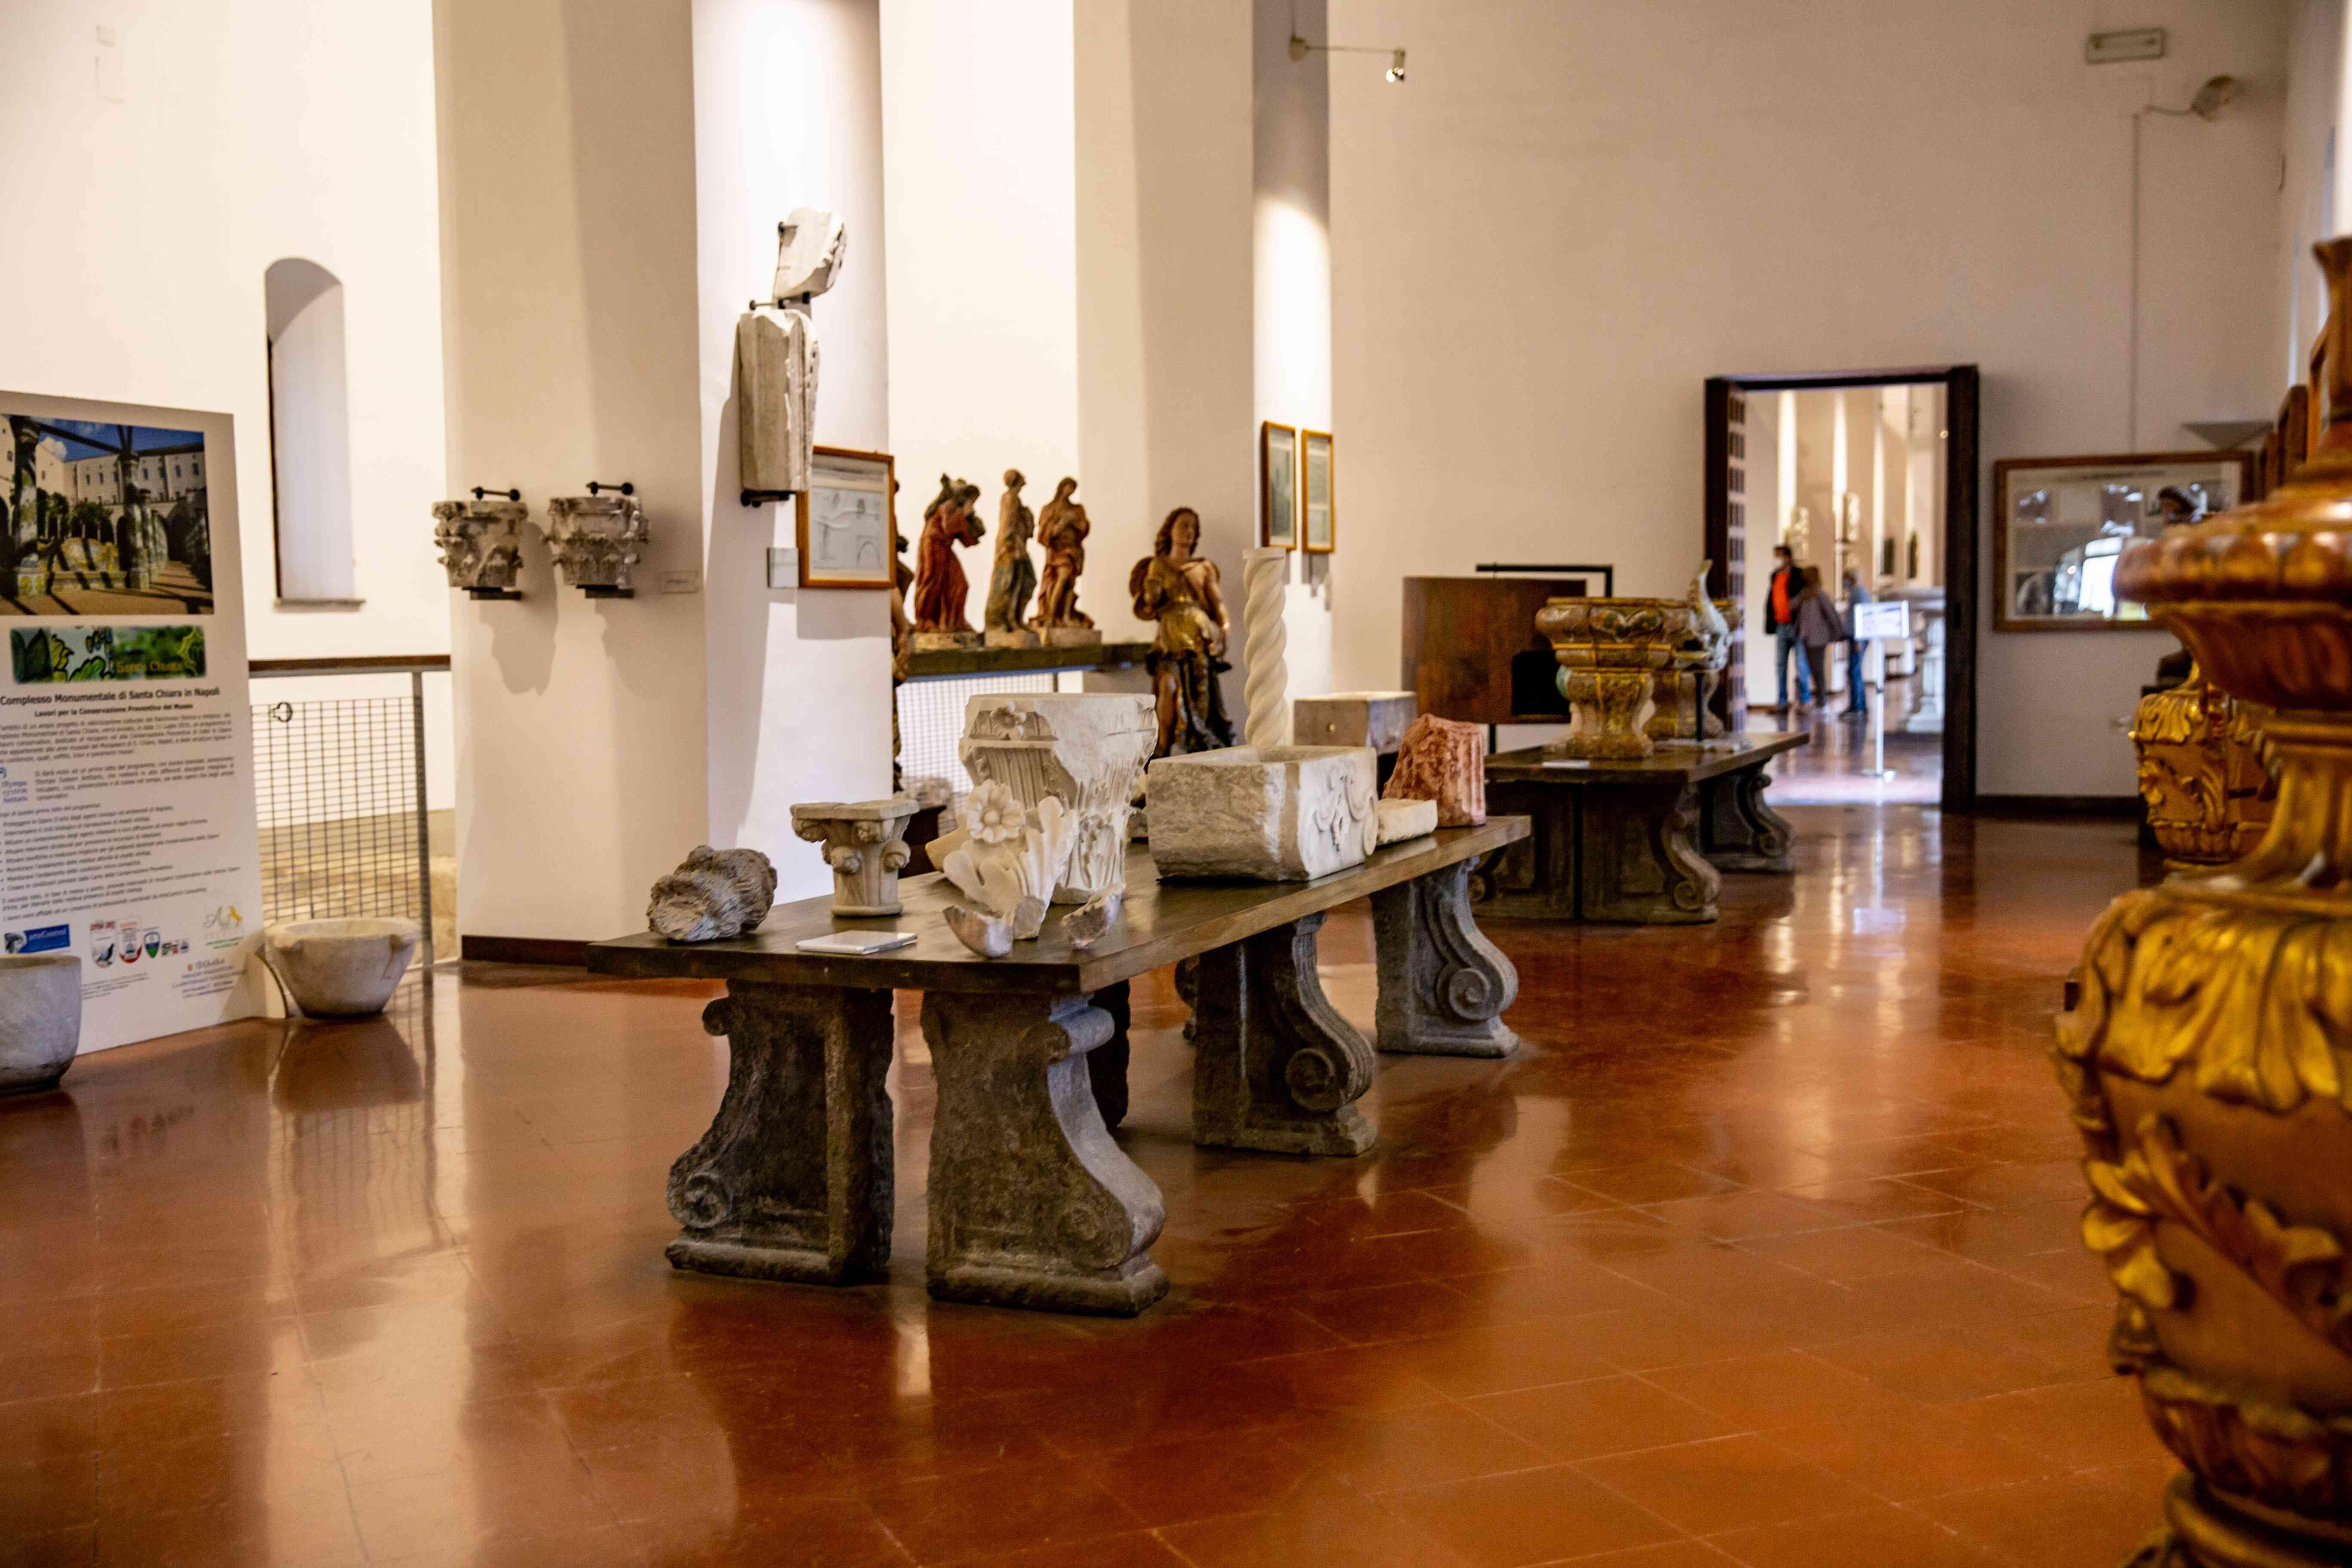 Santa Chiara Monastery and Museum in Naples, Italy